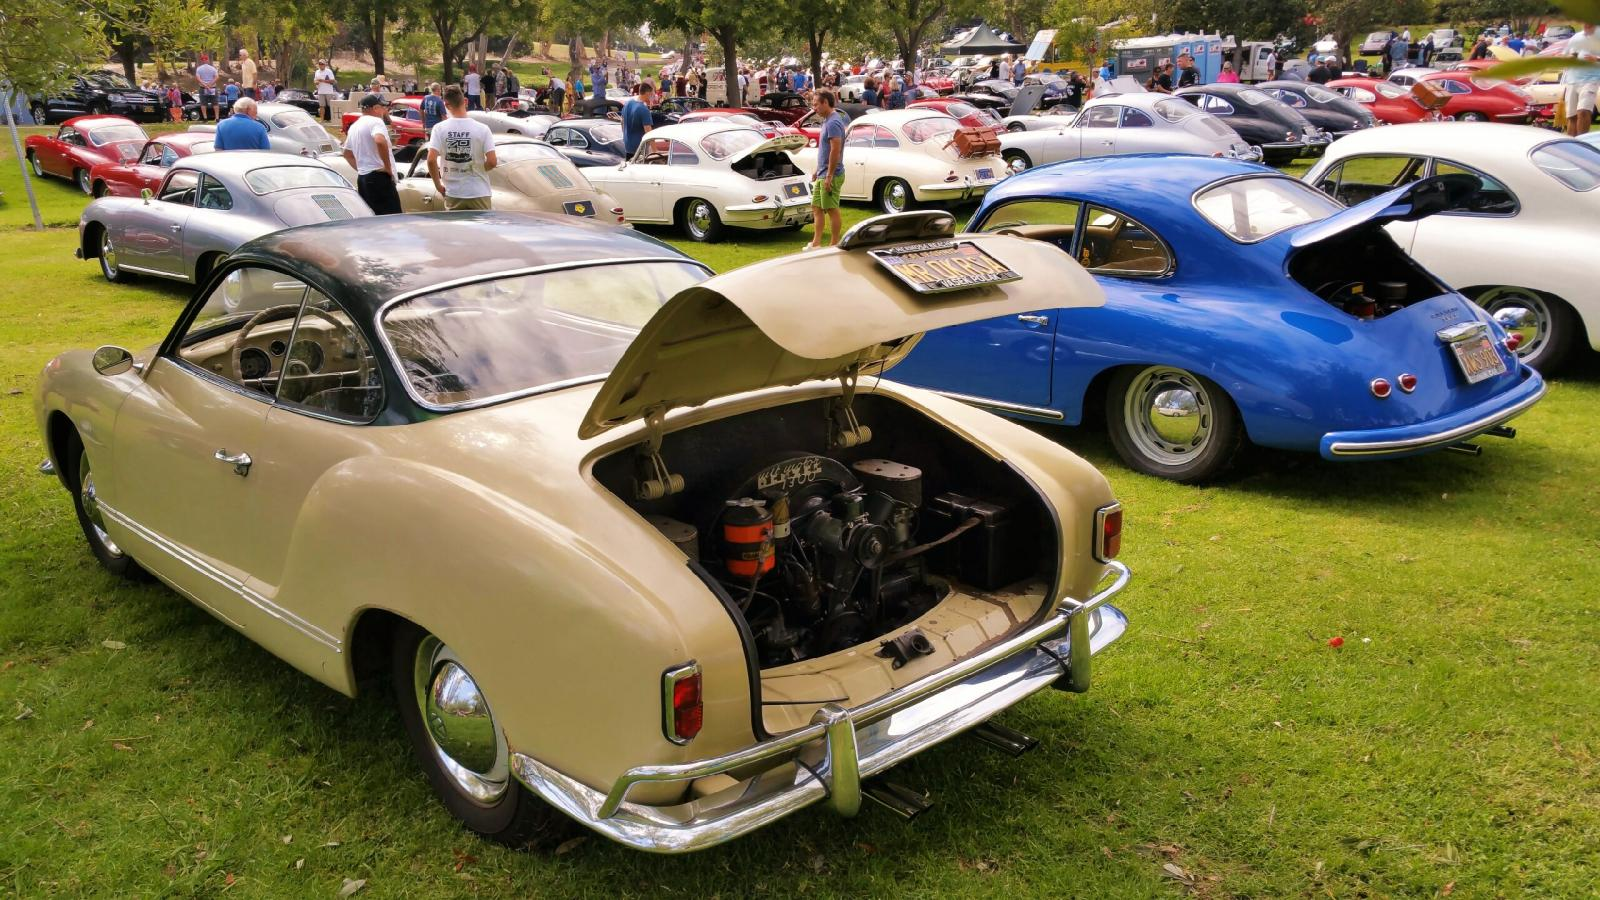 31st Annual Porsche 356 Club Concours